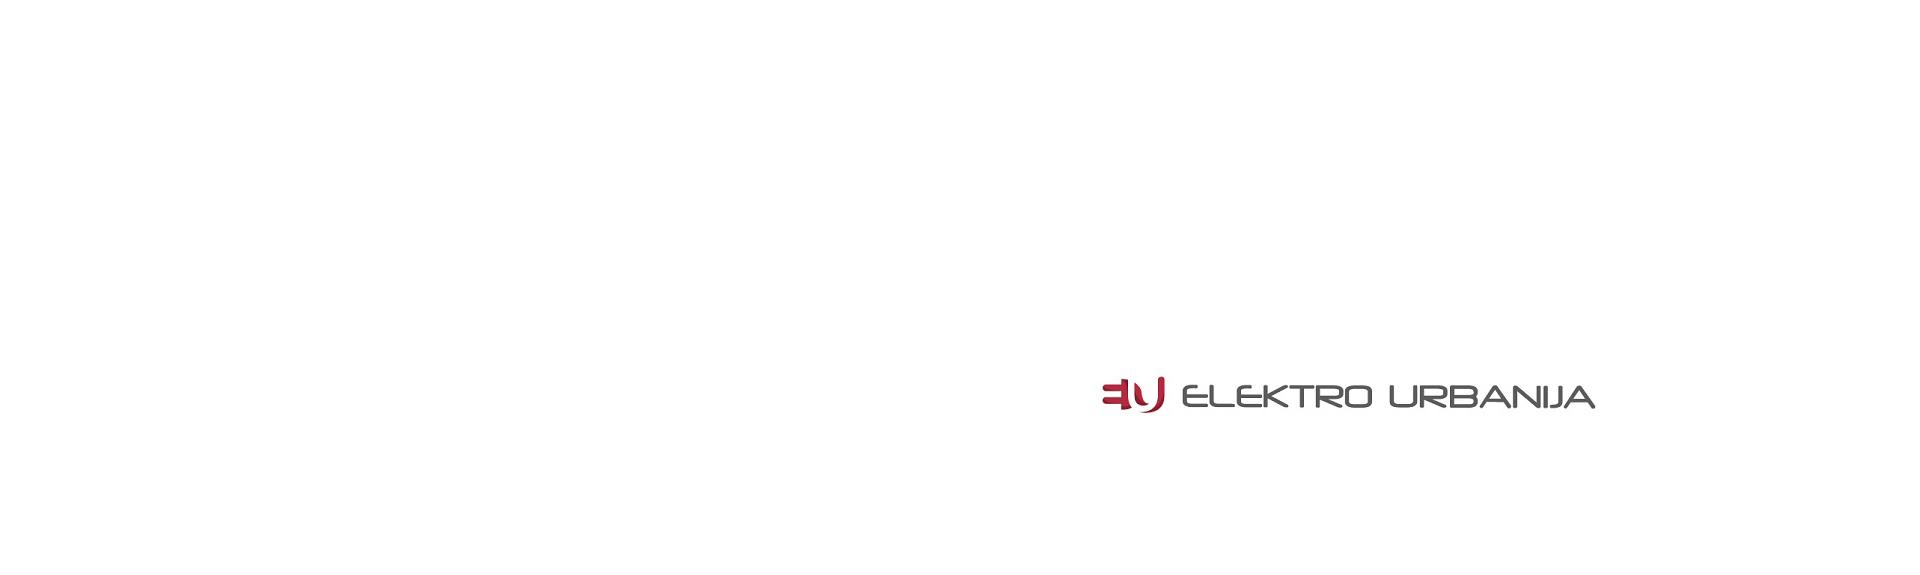 Podjetje Elektro Urbanija zaposli nabavnika – komercialista